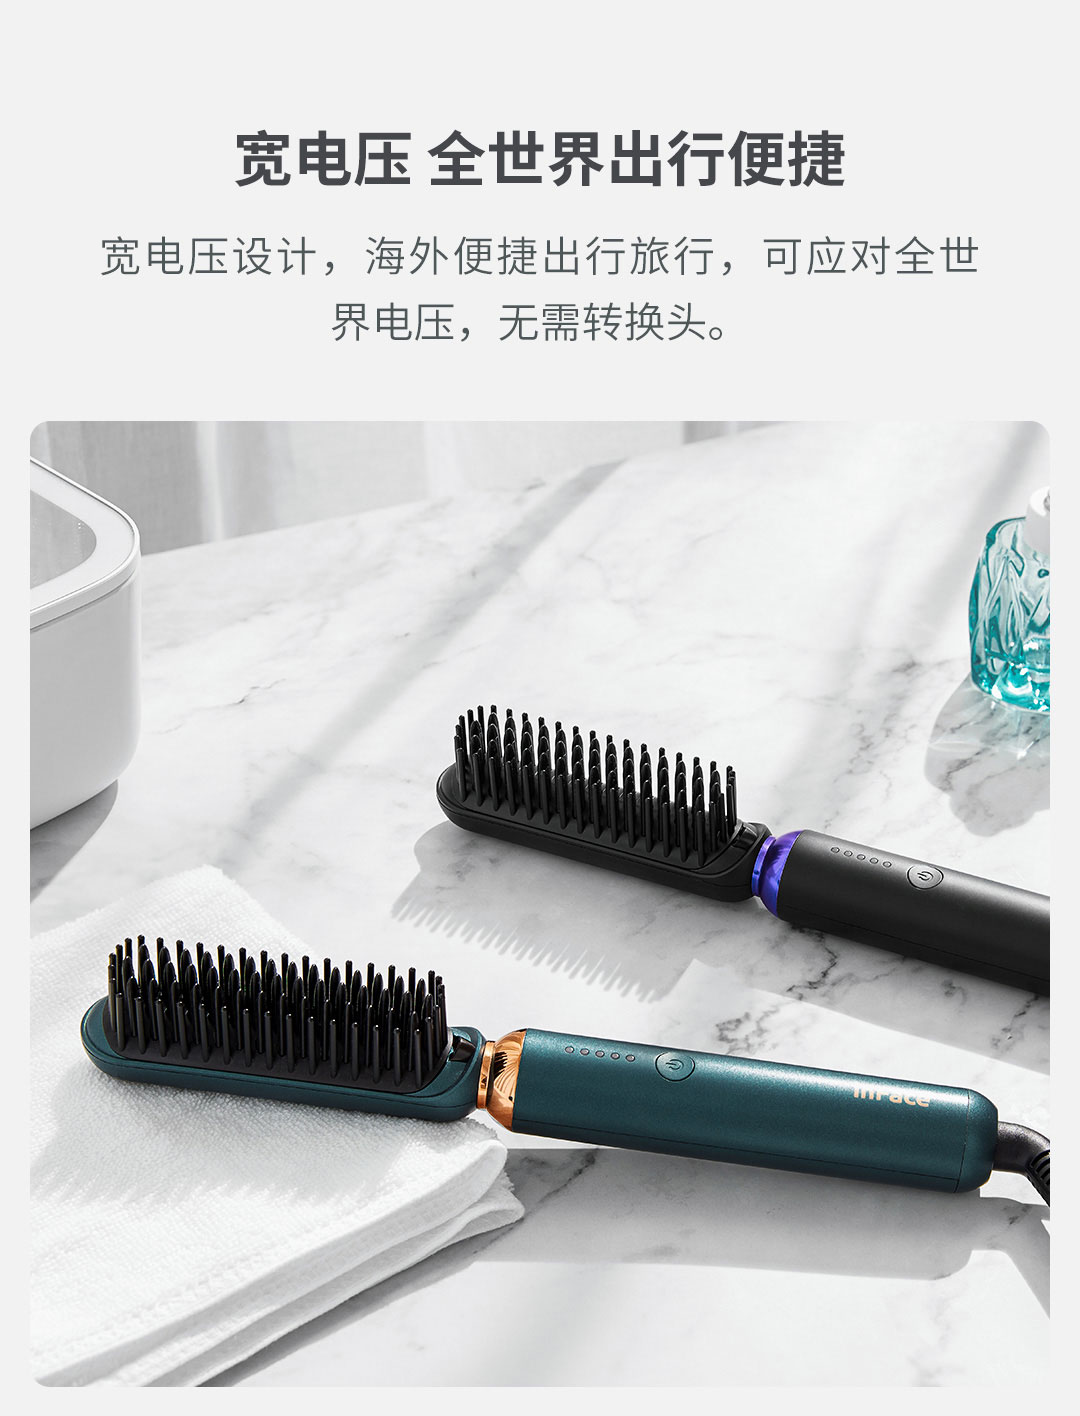 product_奇妙_inFace 直卷发梳